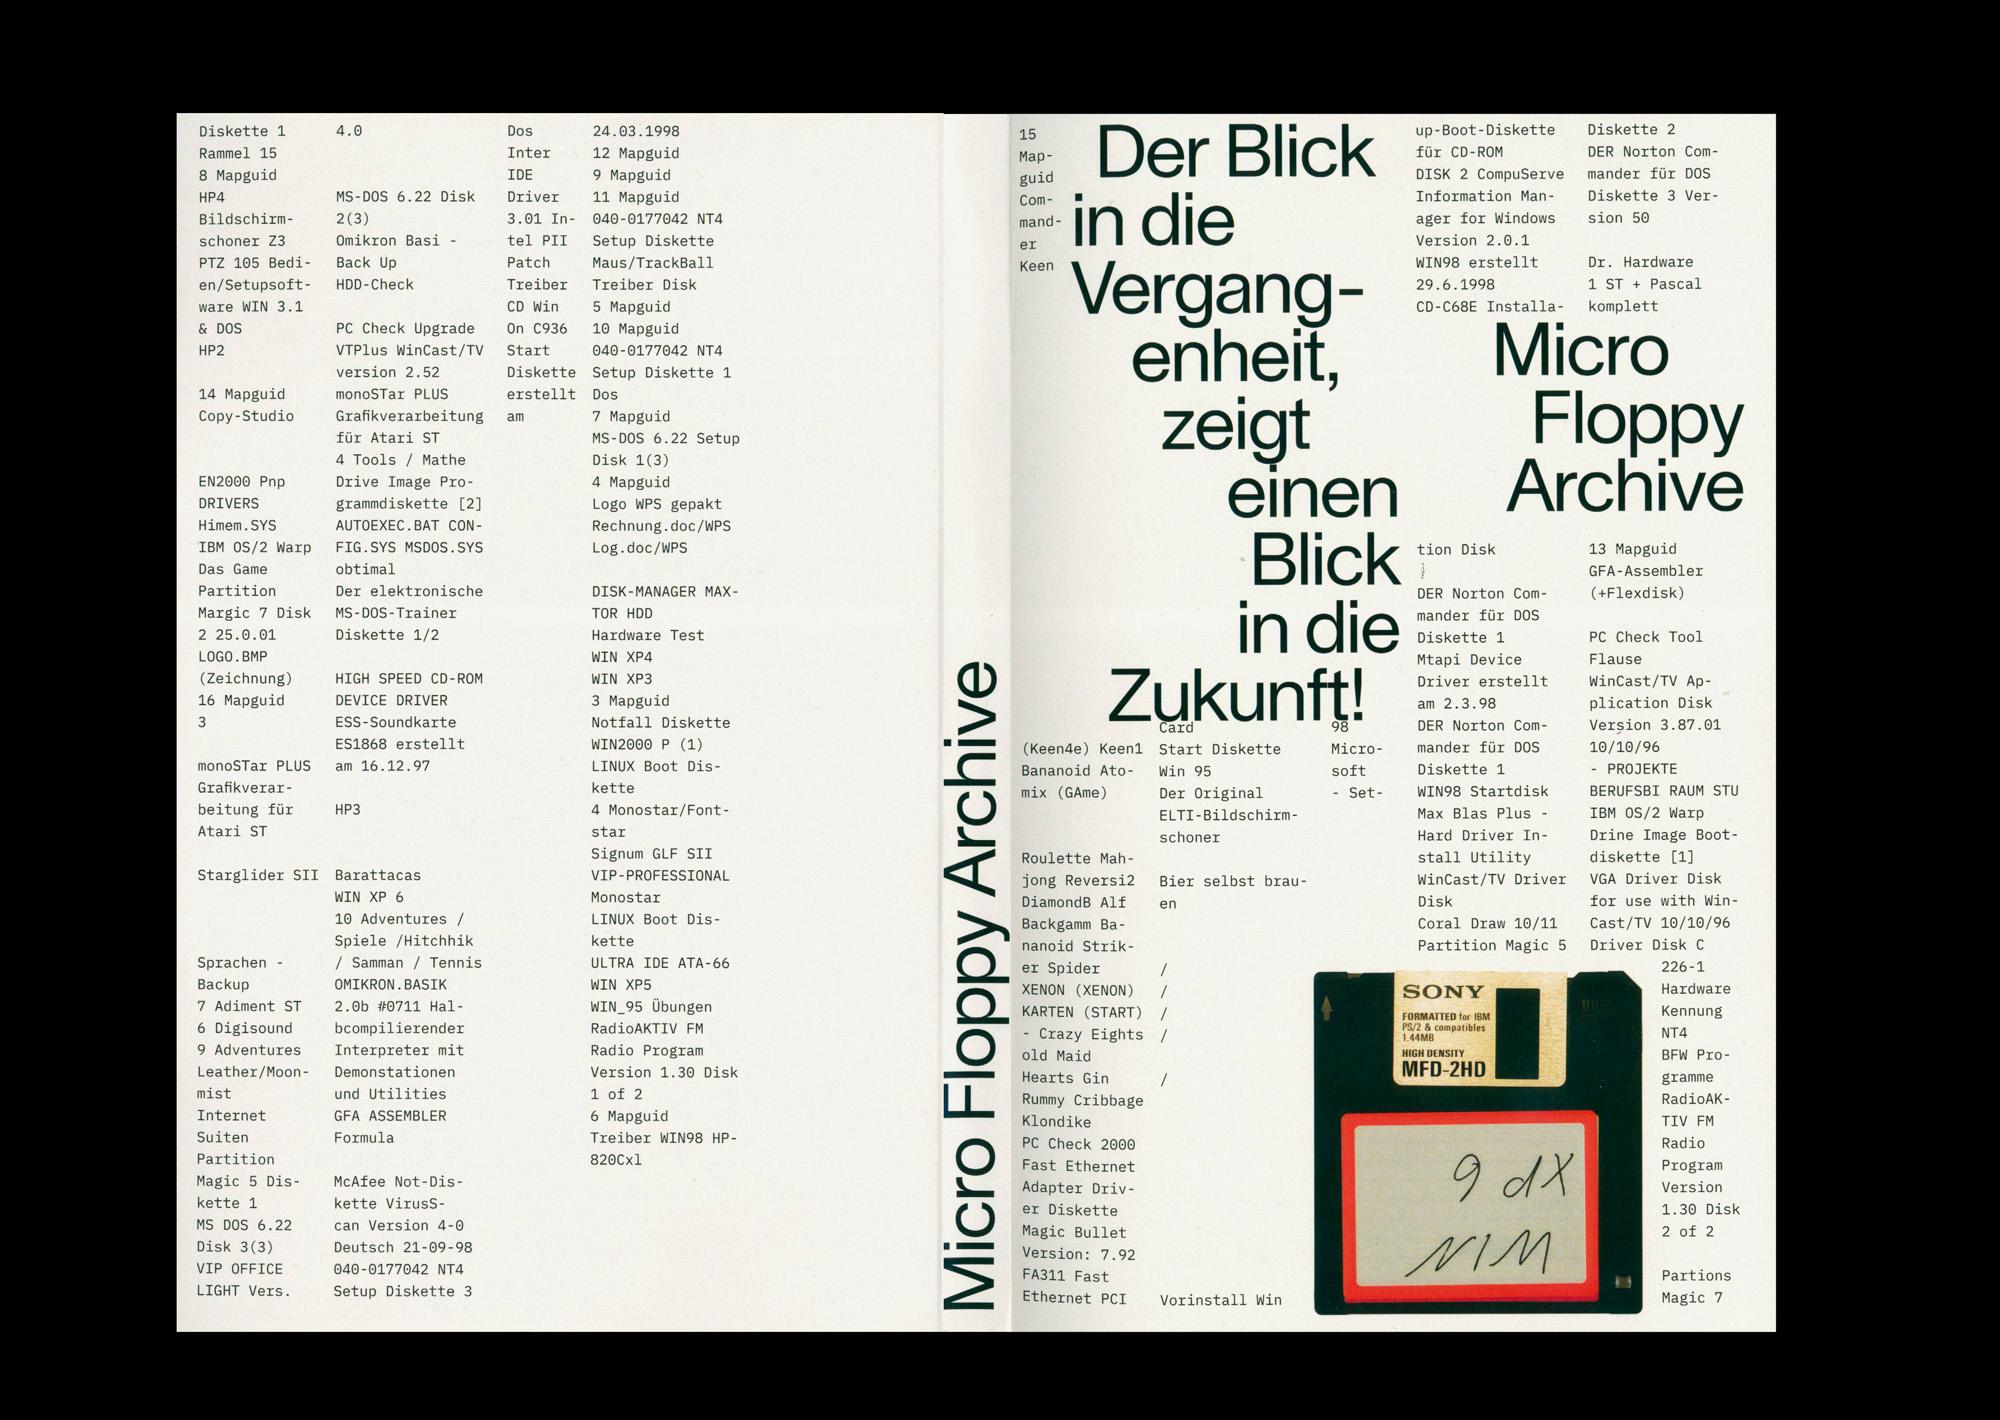 micro floppy archive — david broenner